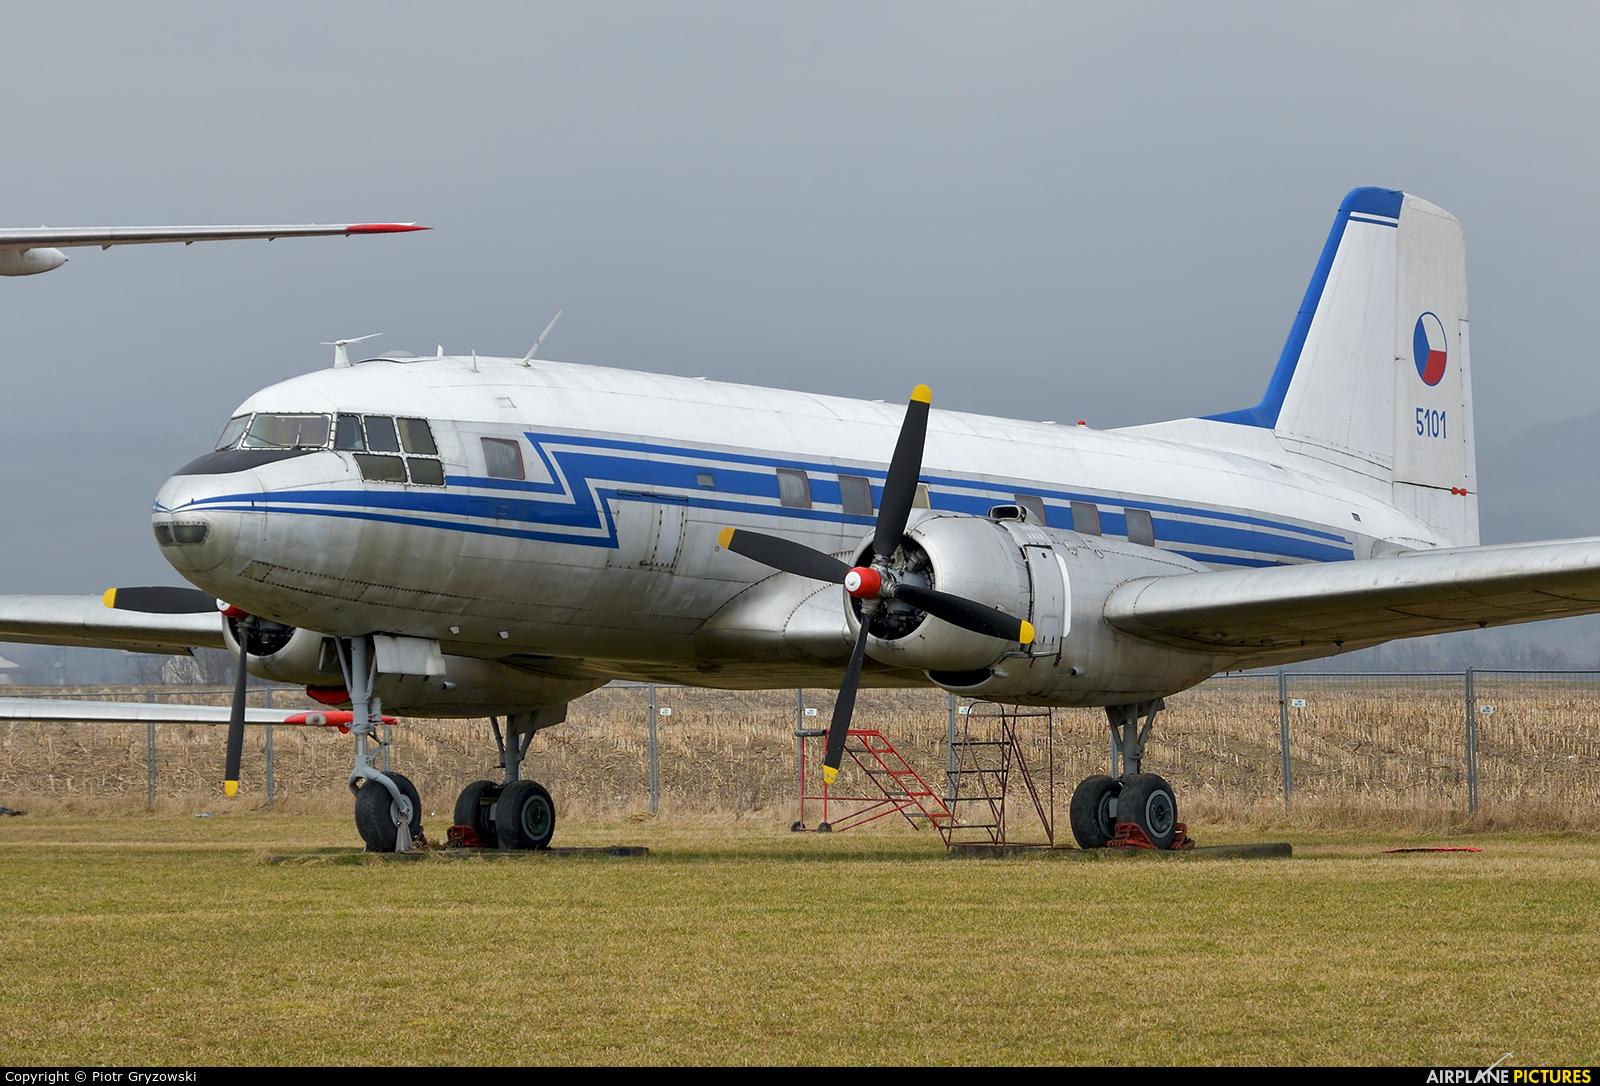 Czechoslovak - Air Force 5101 aircraft at Dubnica nad Vahom - Slavnica